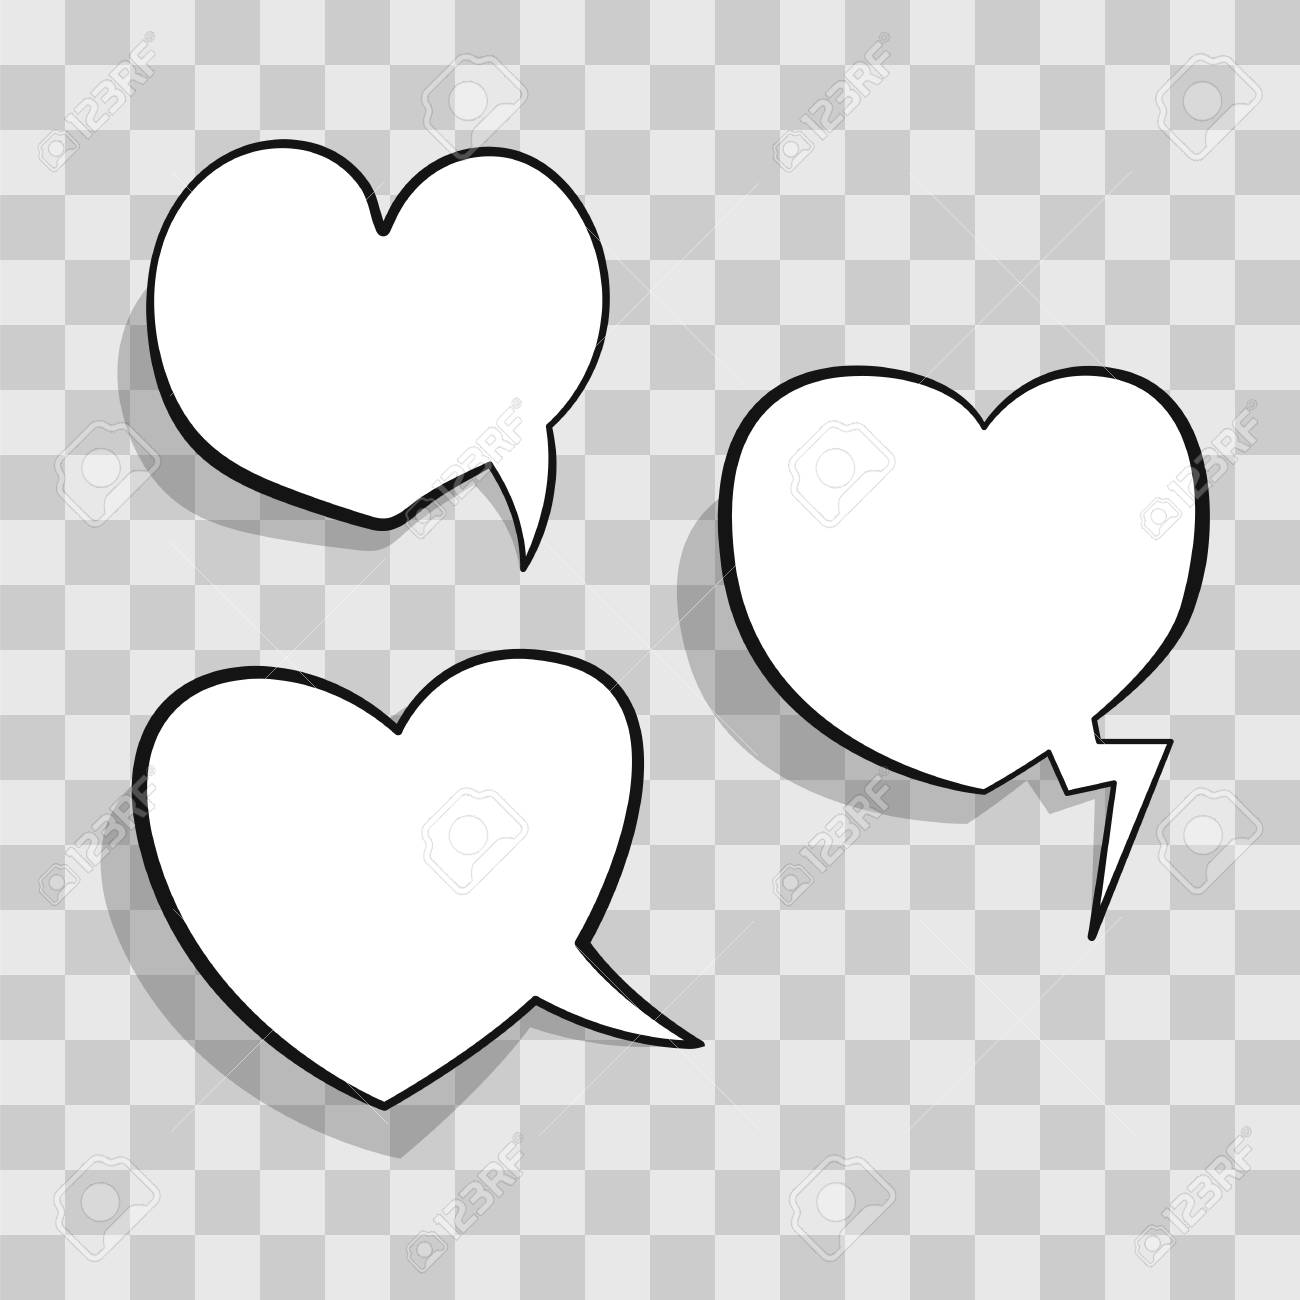 White Speech Bubble In Heart Shape For Chat In Social Networks